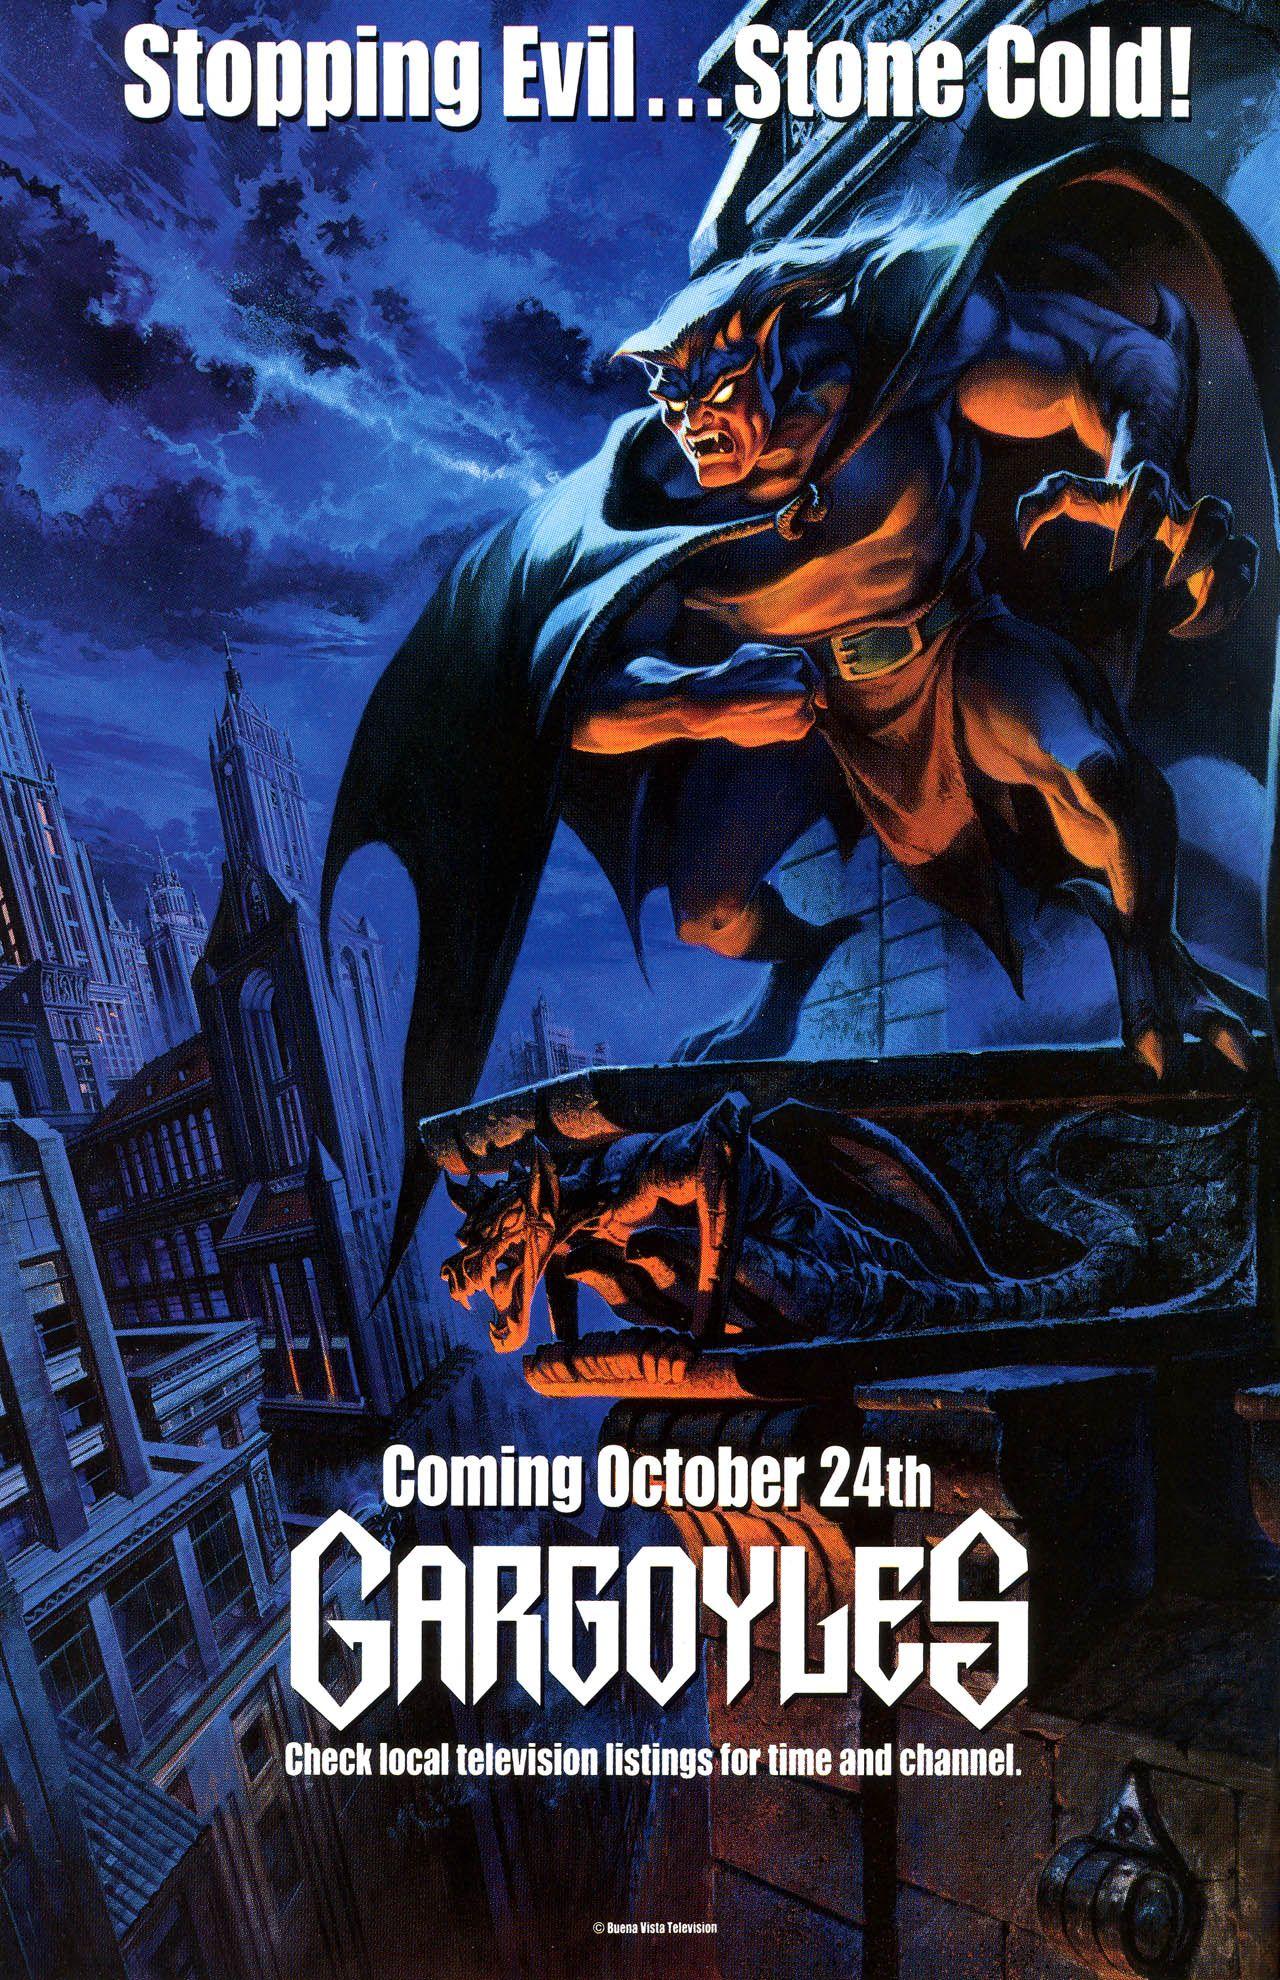 Gargoyles ad gargoyles cartoon gargoyles disney